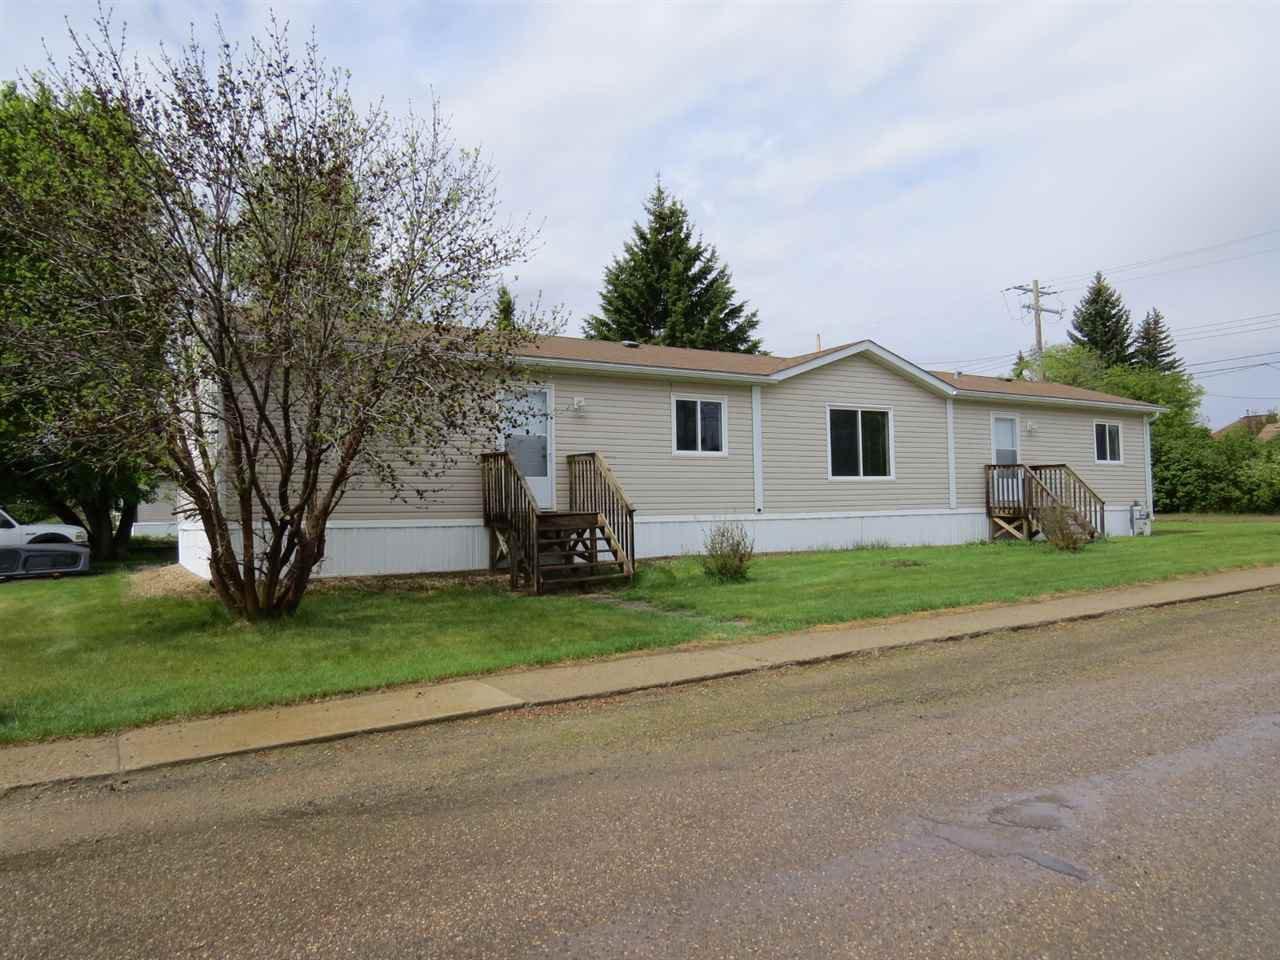 Main Photo: 5040 47 Street: Hardisty House for sale : MLS®# E4201024